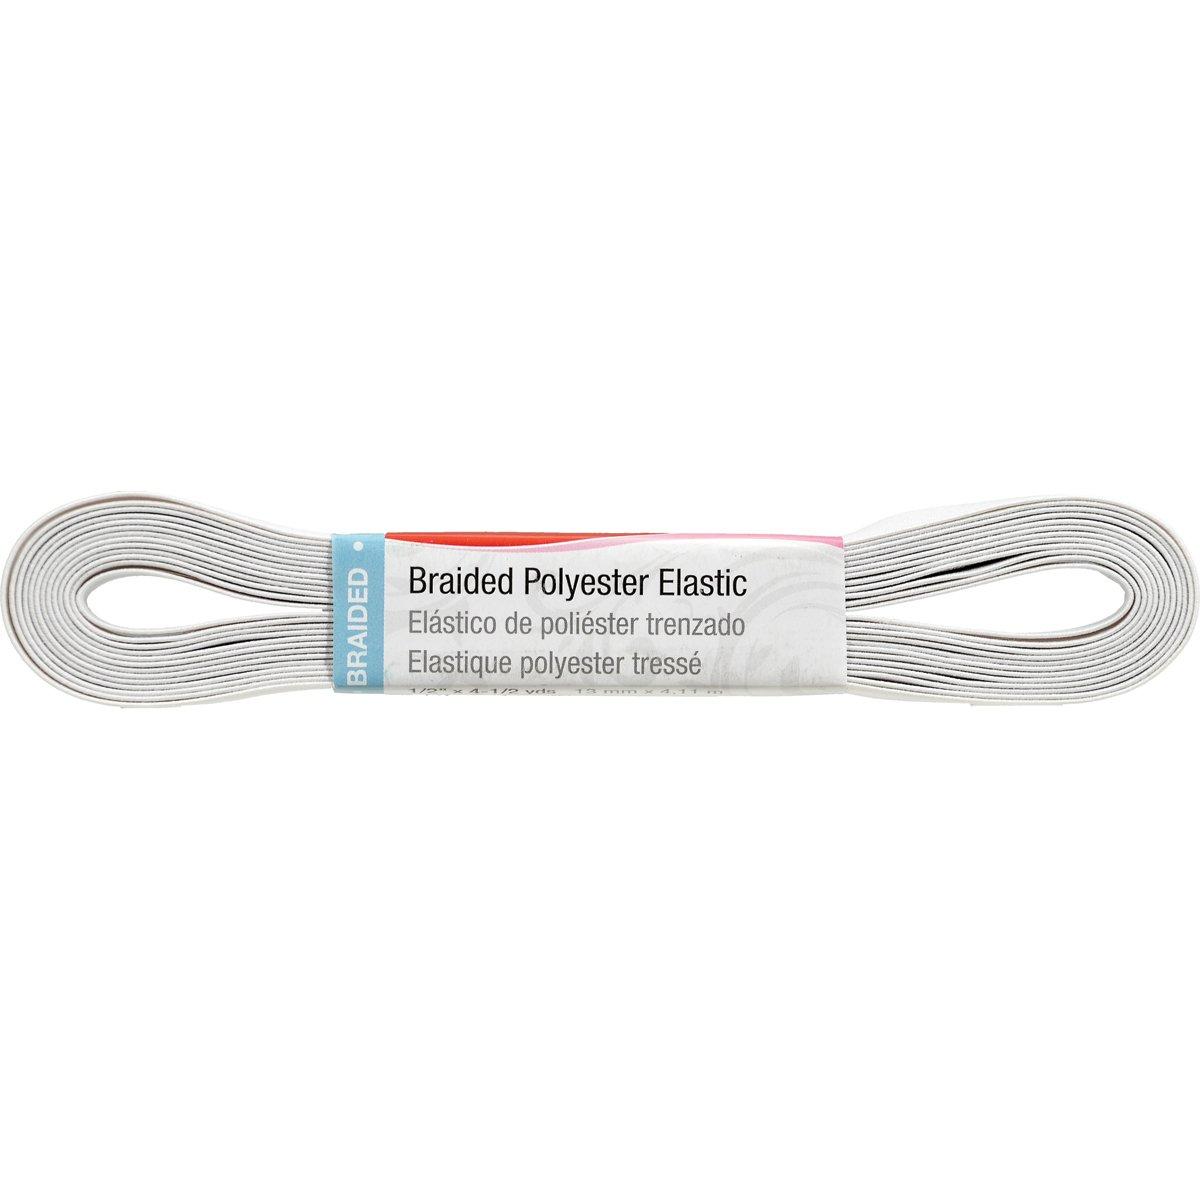 Singer Braided Elastic, White, 6-Yard by 3/8-Inch 70082